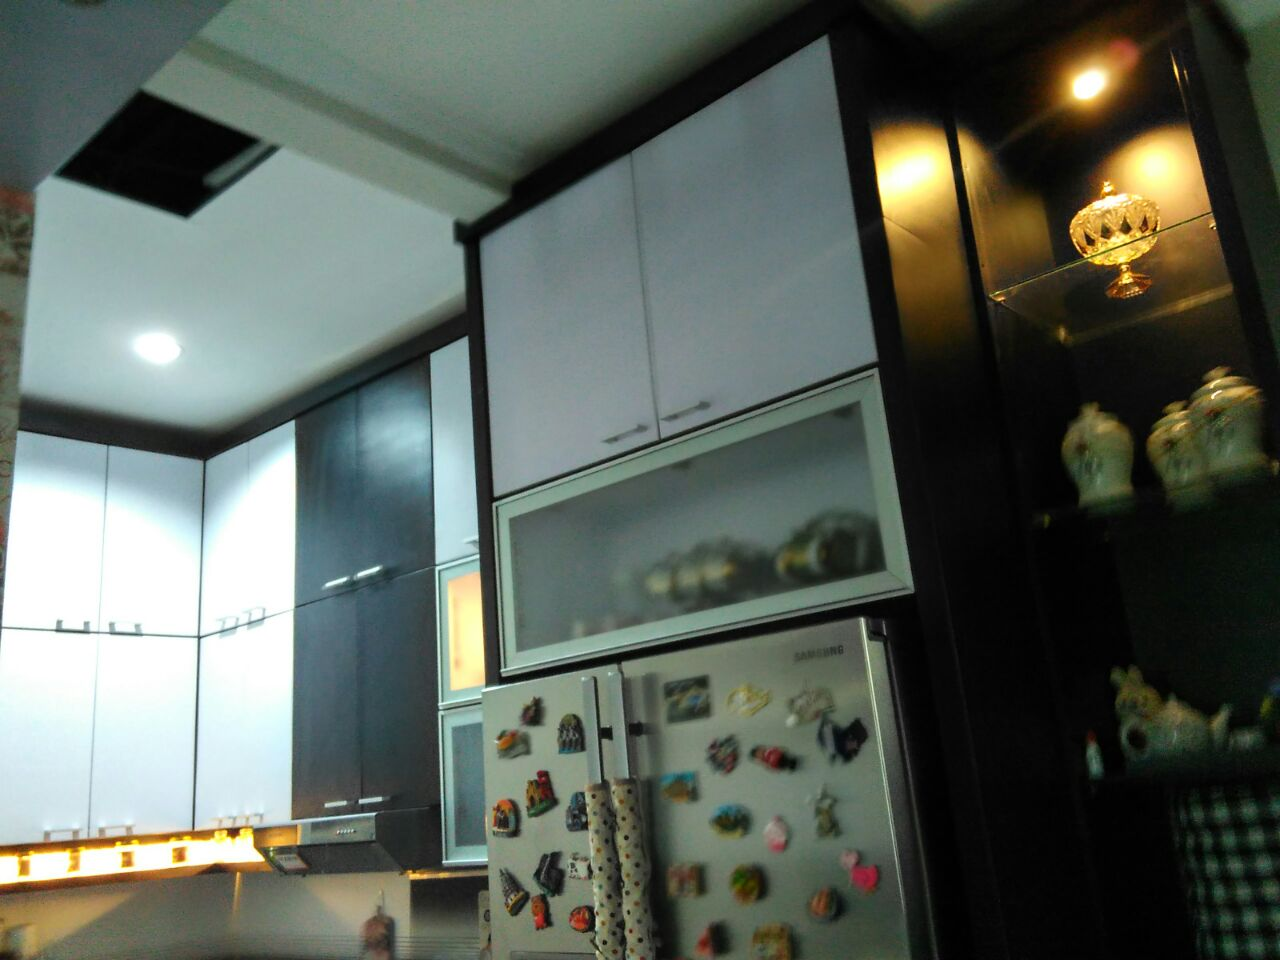 jual kitchen set surabaya pasuruan sidoarjo